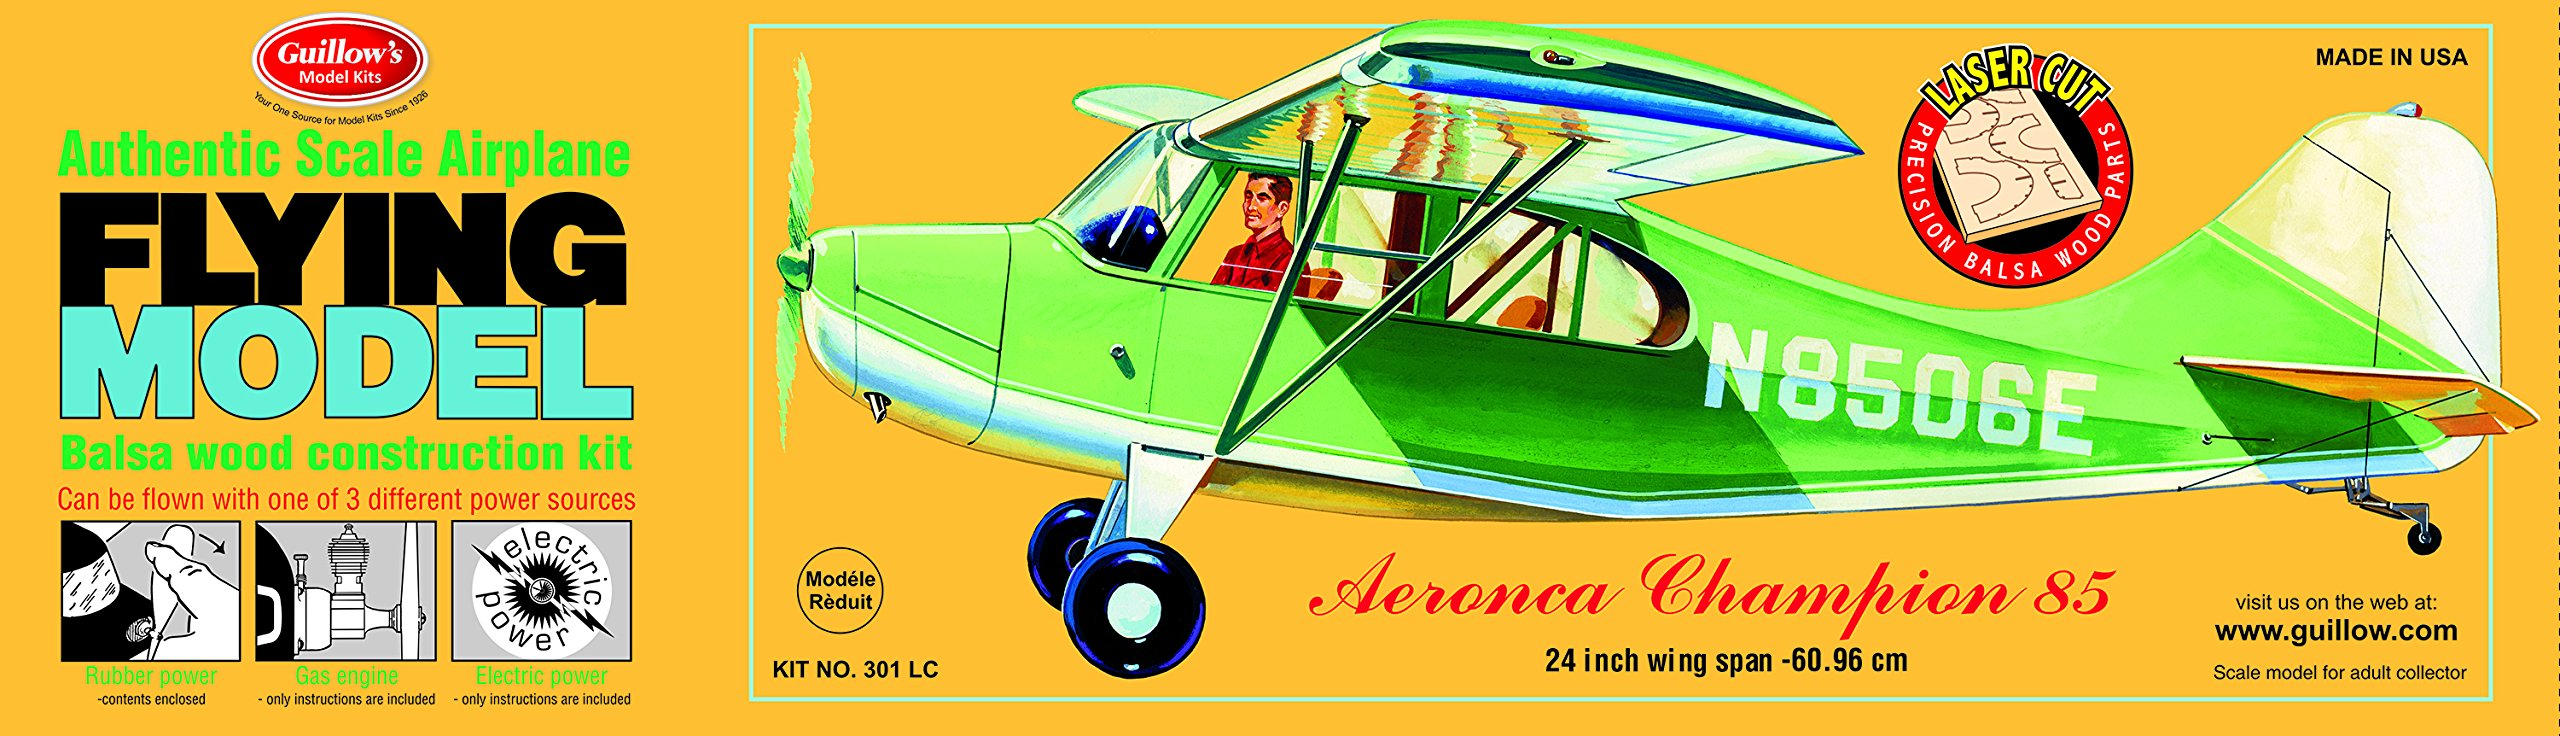 Guillow's Aeronca Champion Balsa Model Airplane Model Kit by Guillow